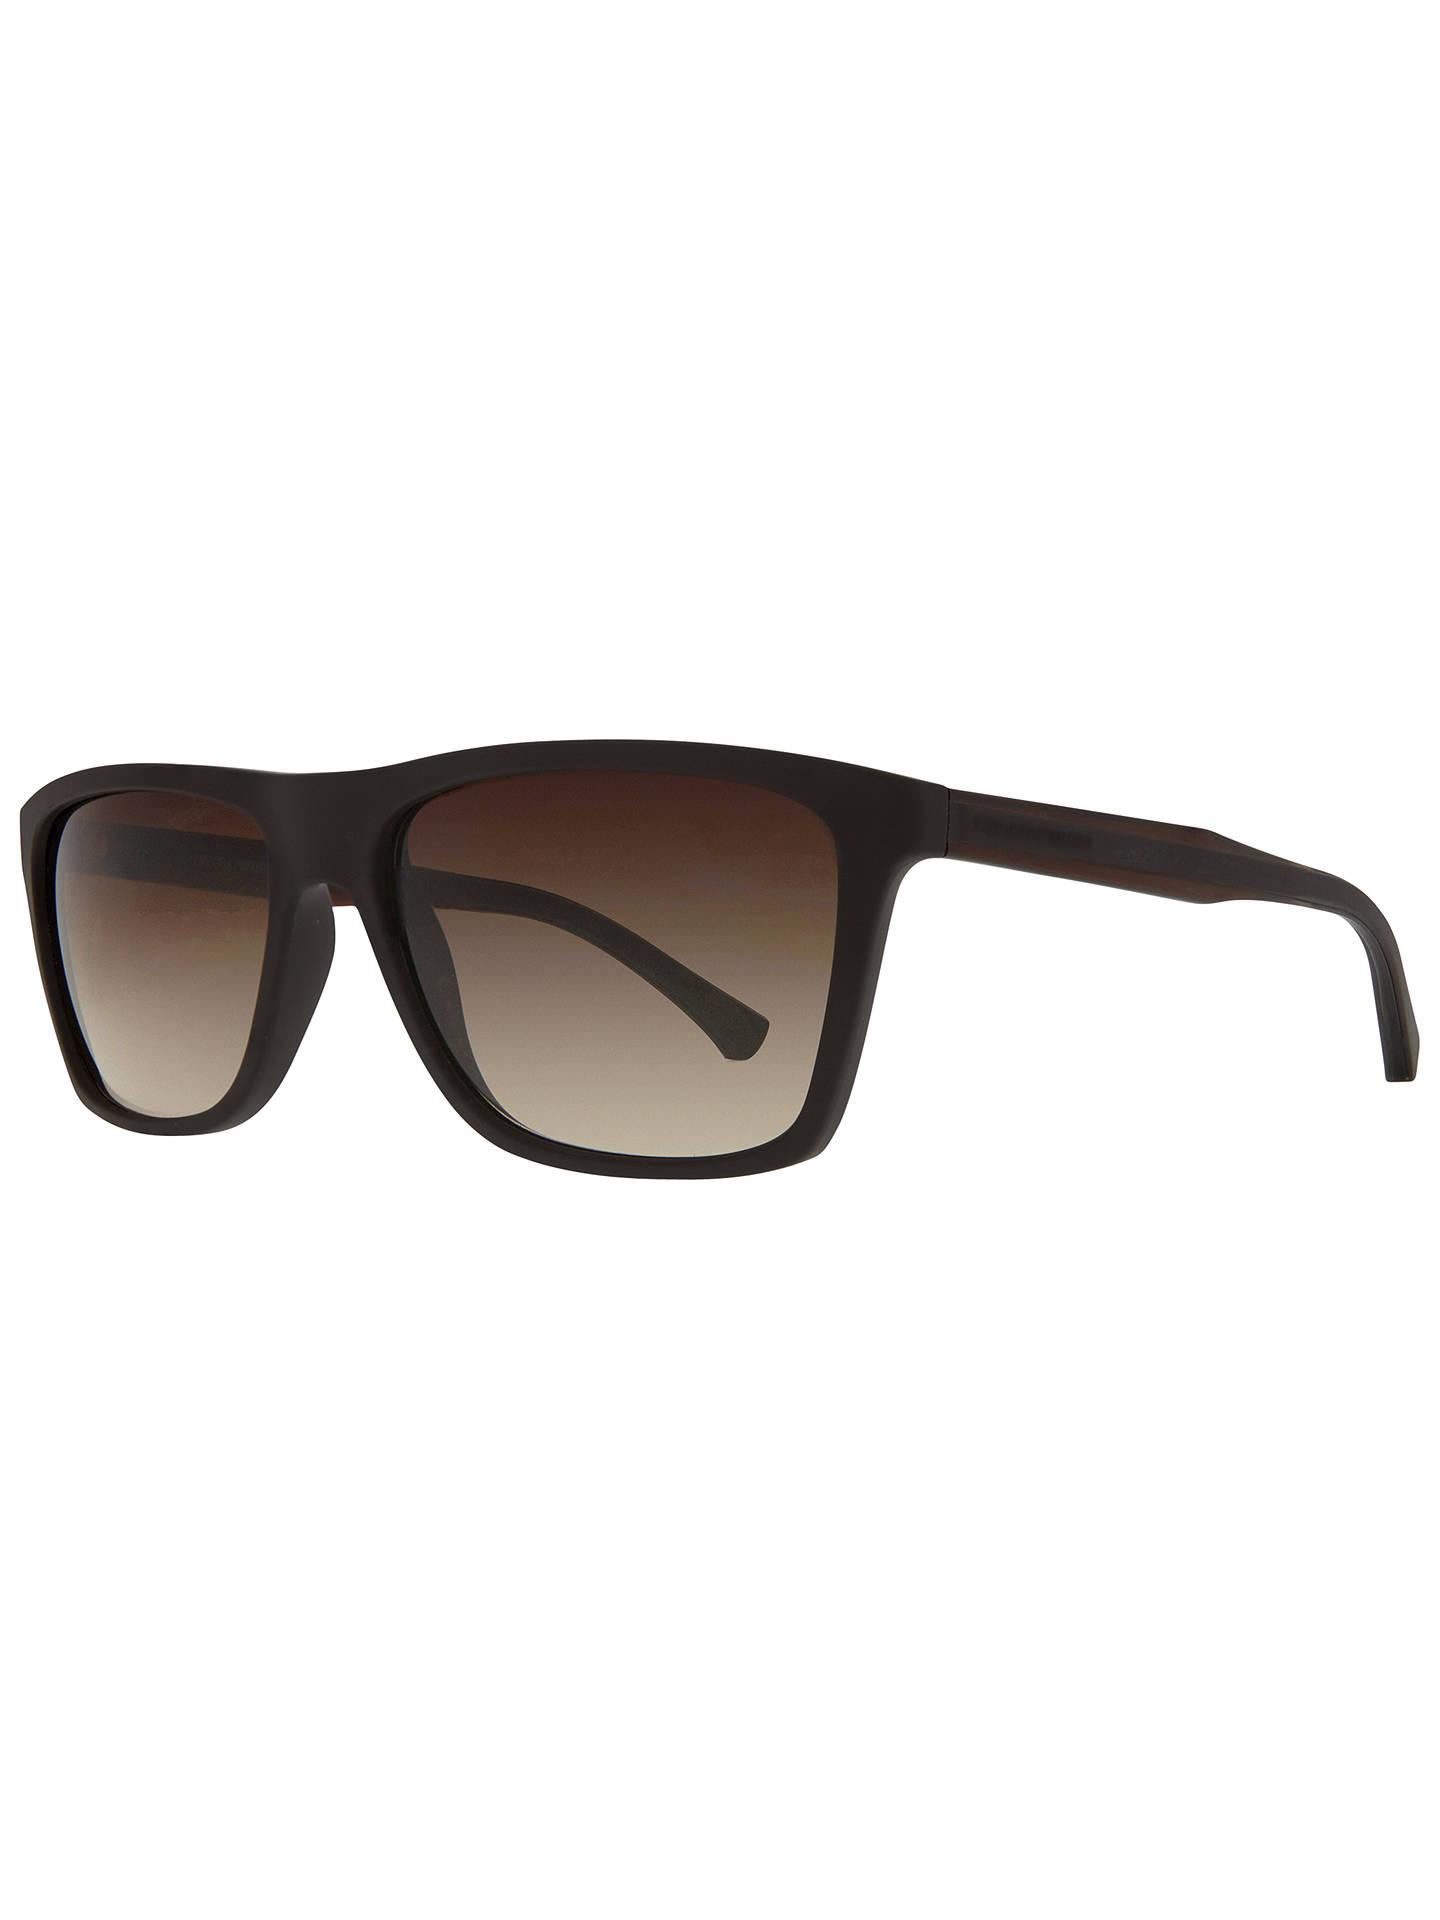 f2eb3d43abc7 Buy Emporio Armani EA4001 Rectangular Sunglasses